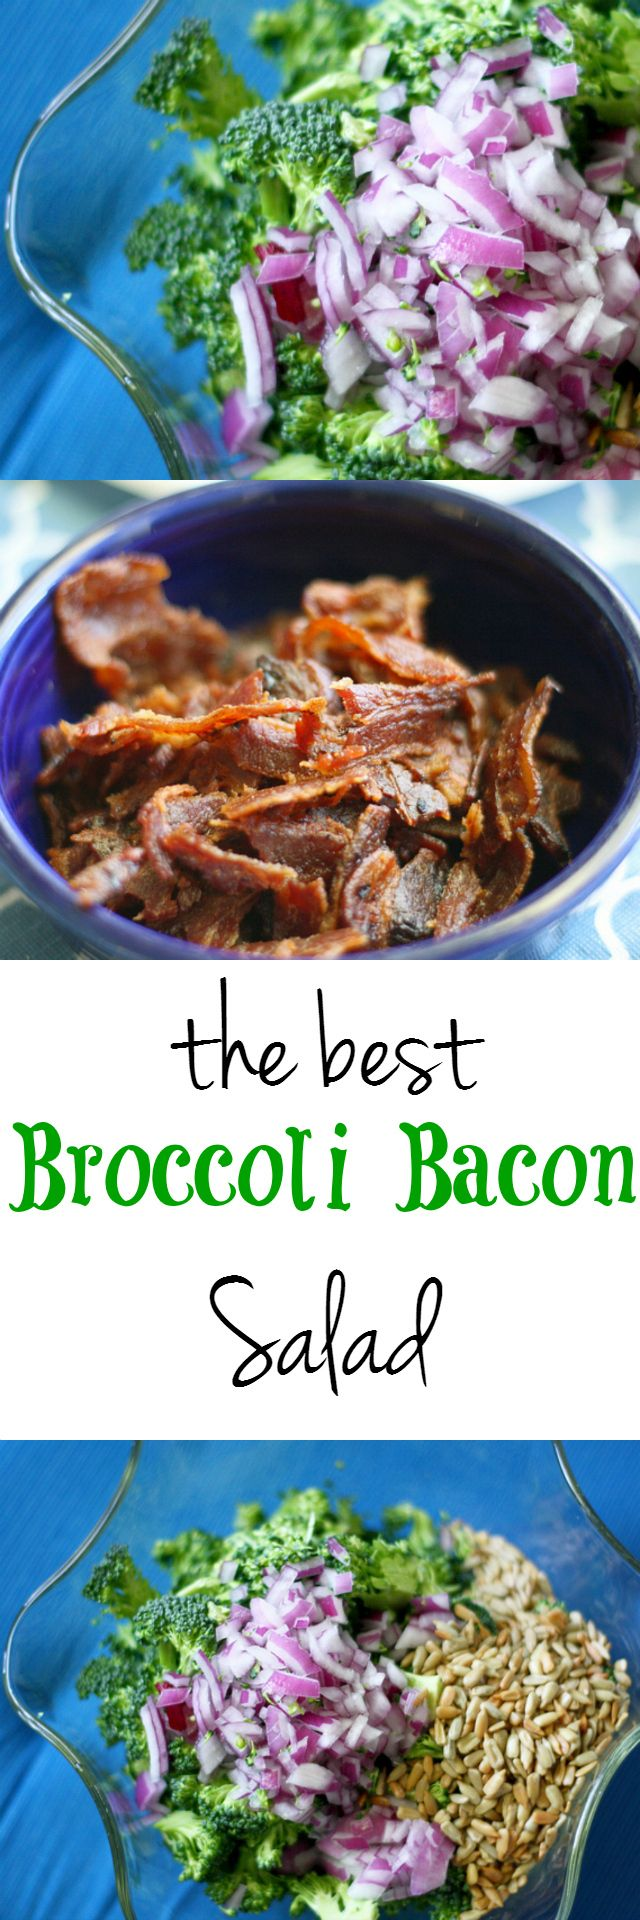 where to buy nike socks online Crunchy Broccoli Salad   Recipe   Broccoli Salads  Salad and Dressing